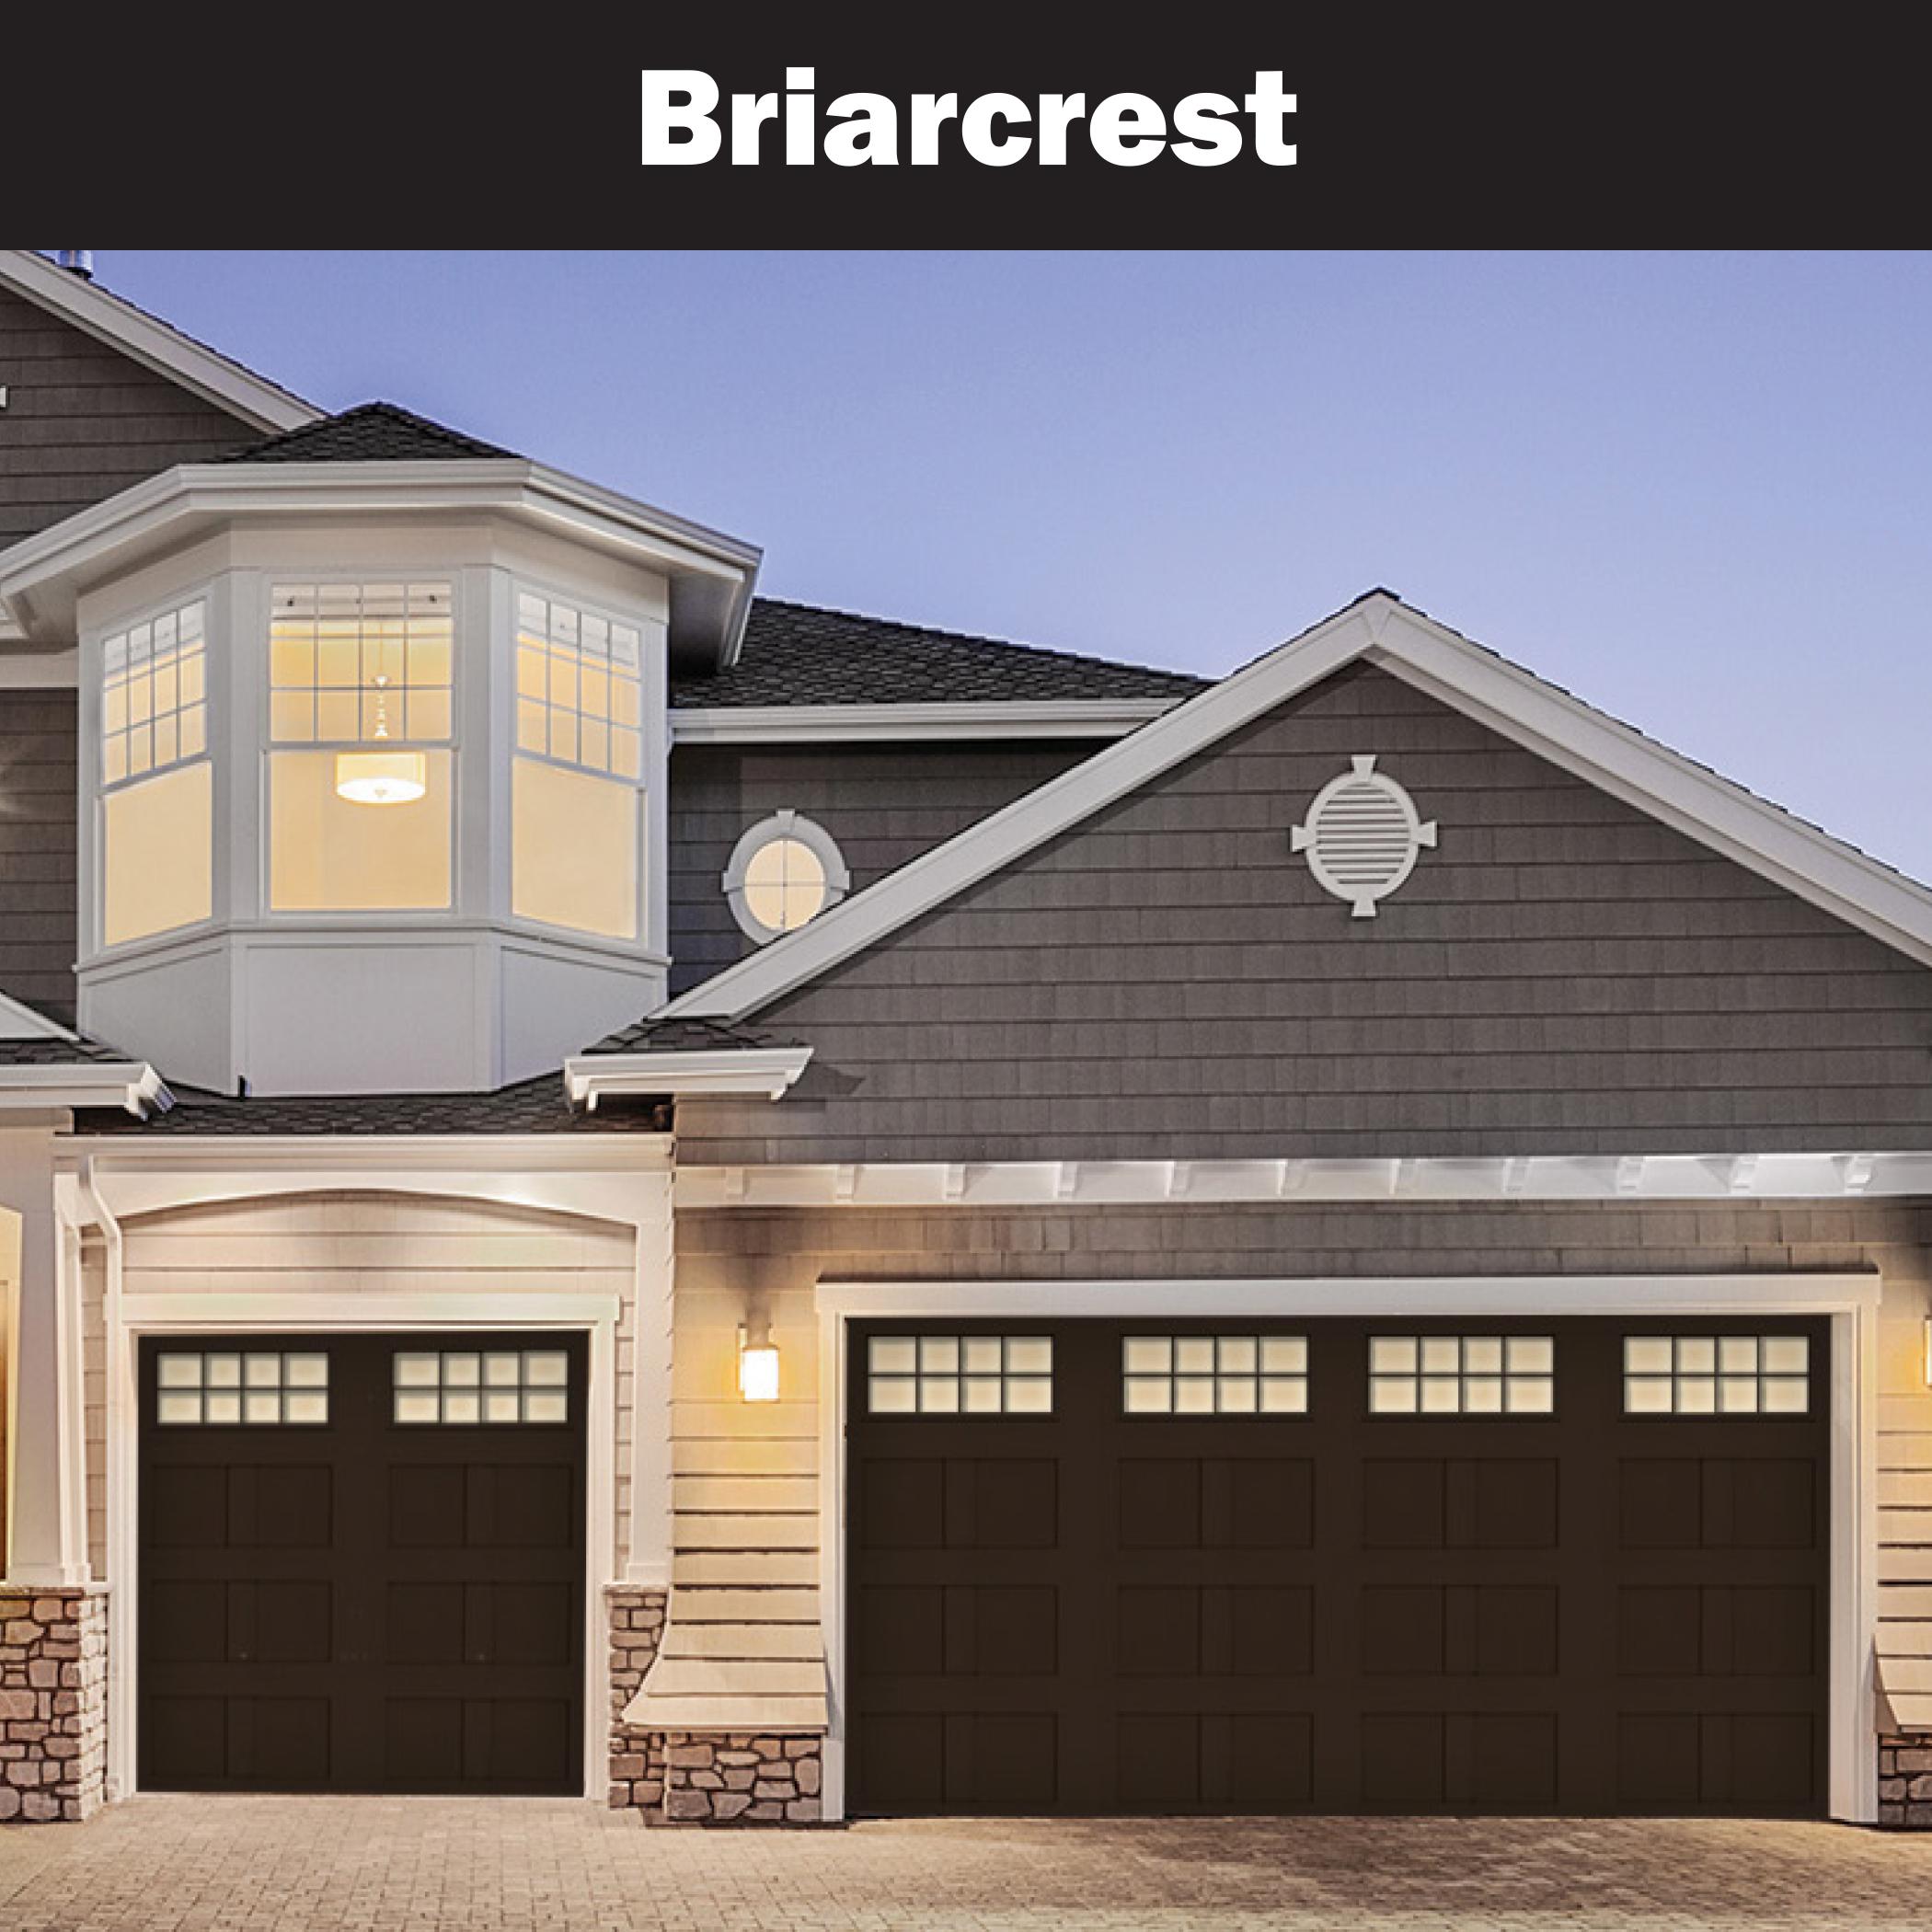 Briarcrest.jpg